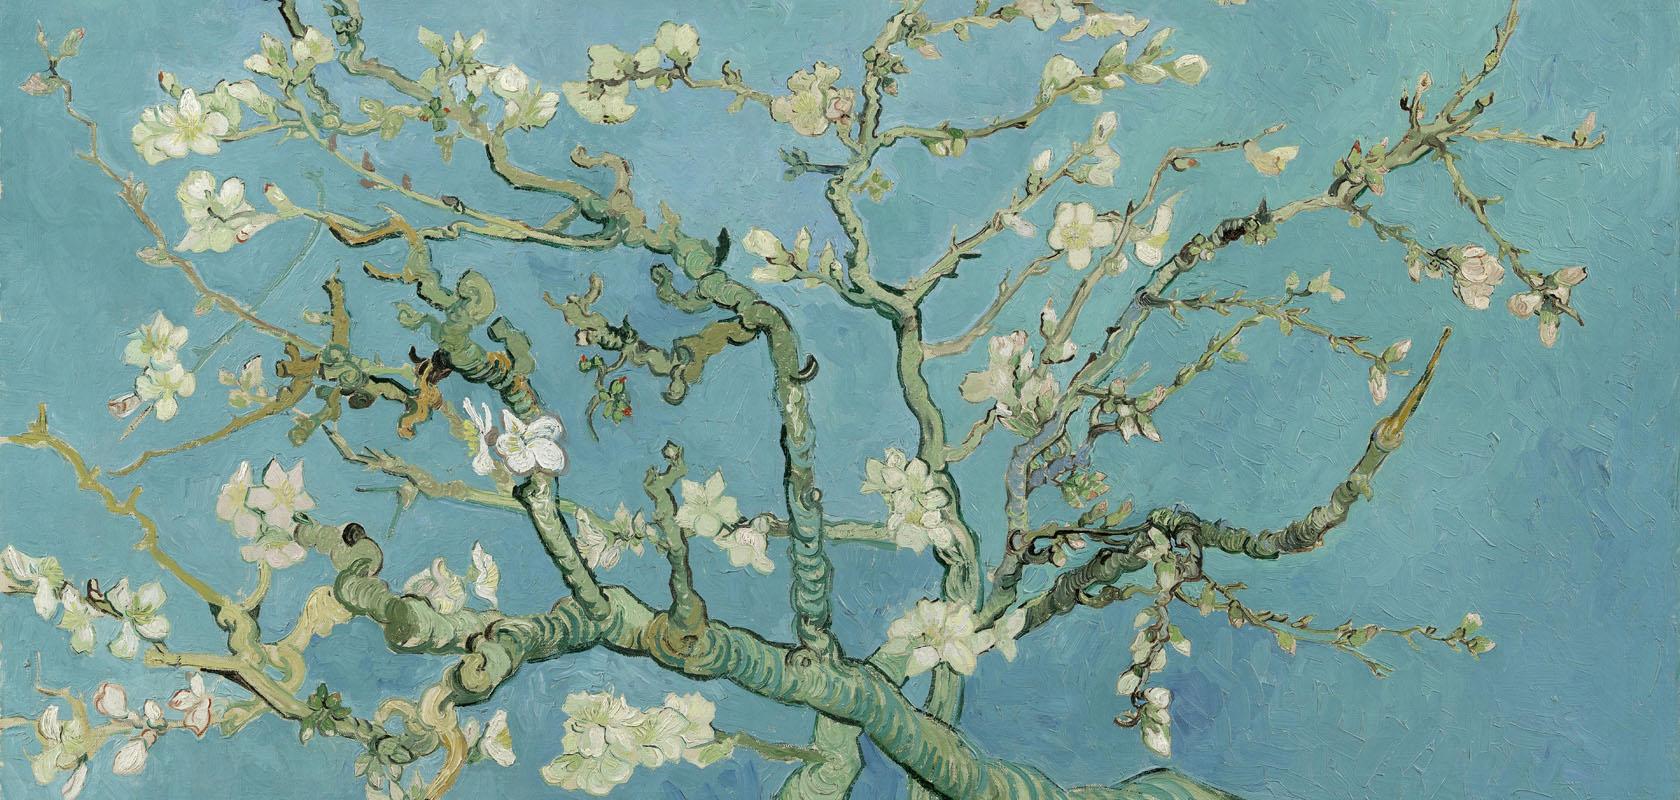 Amandelbloesem-Vincent-van-Gogh-1890-Van-Gogh-Museum-3